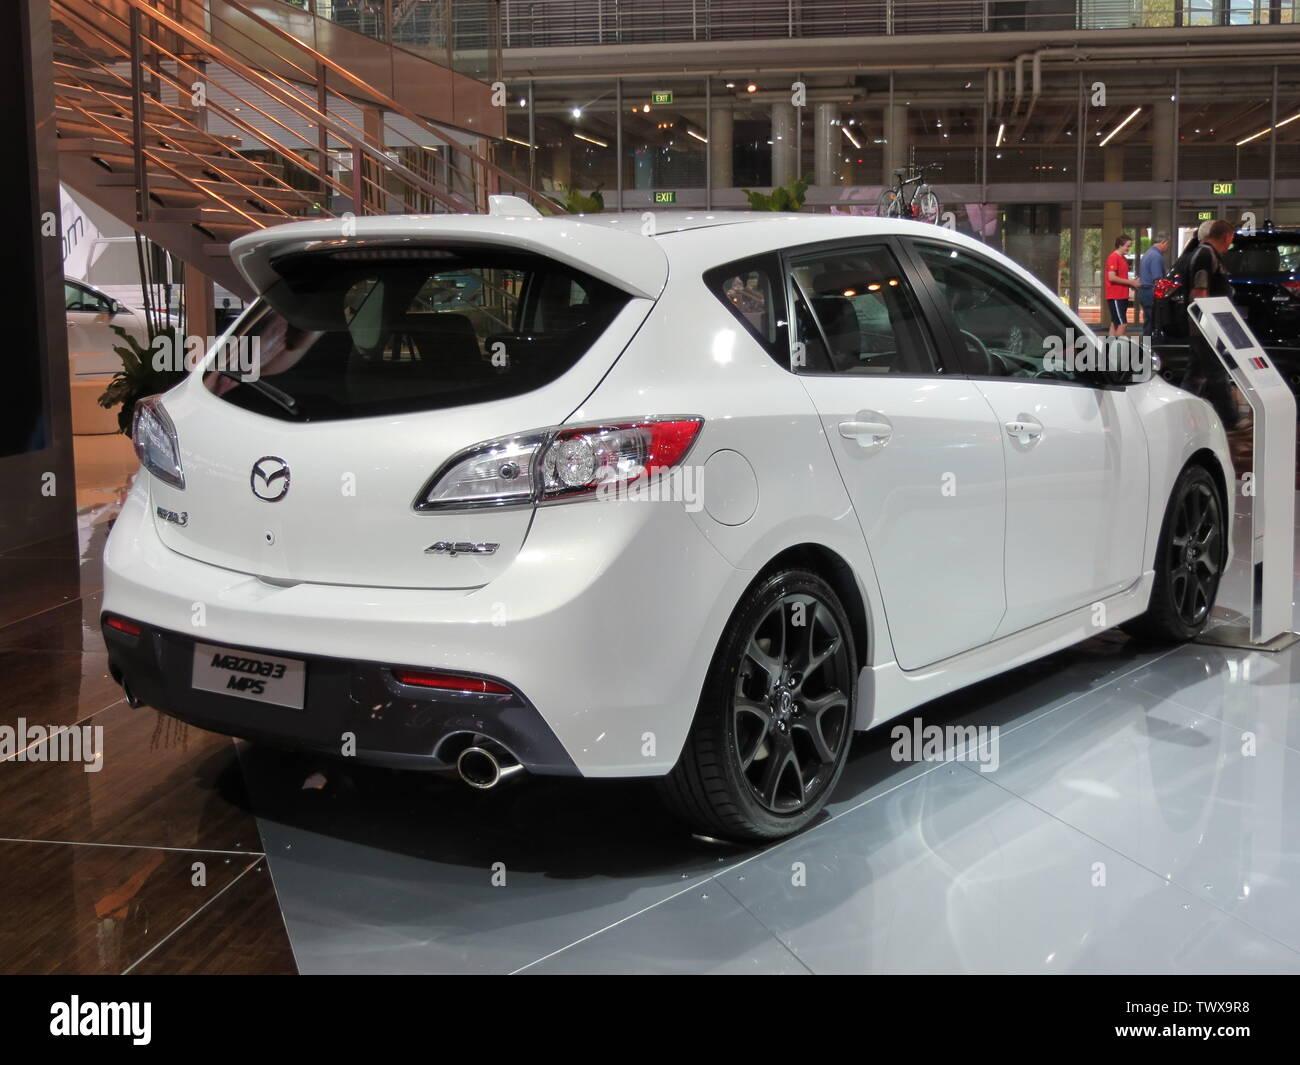 Kelebihan Mazda 3 2012 Spesifikasi